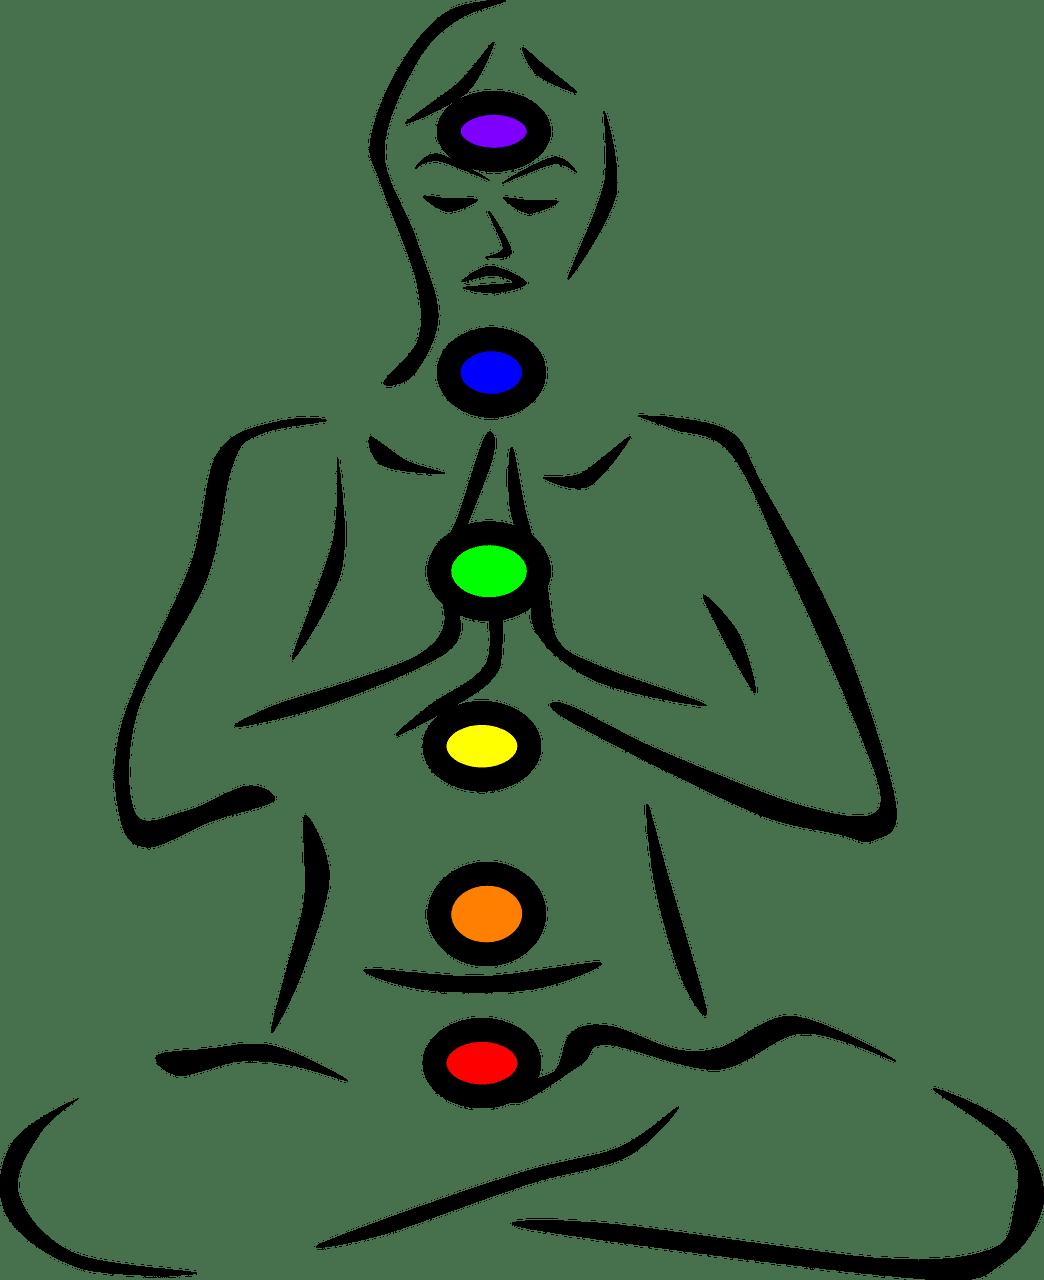 hochsensibilitaet-7-chakras